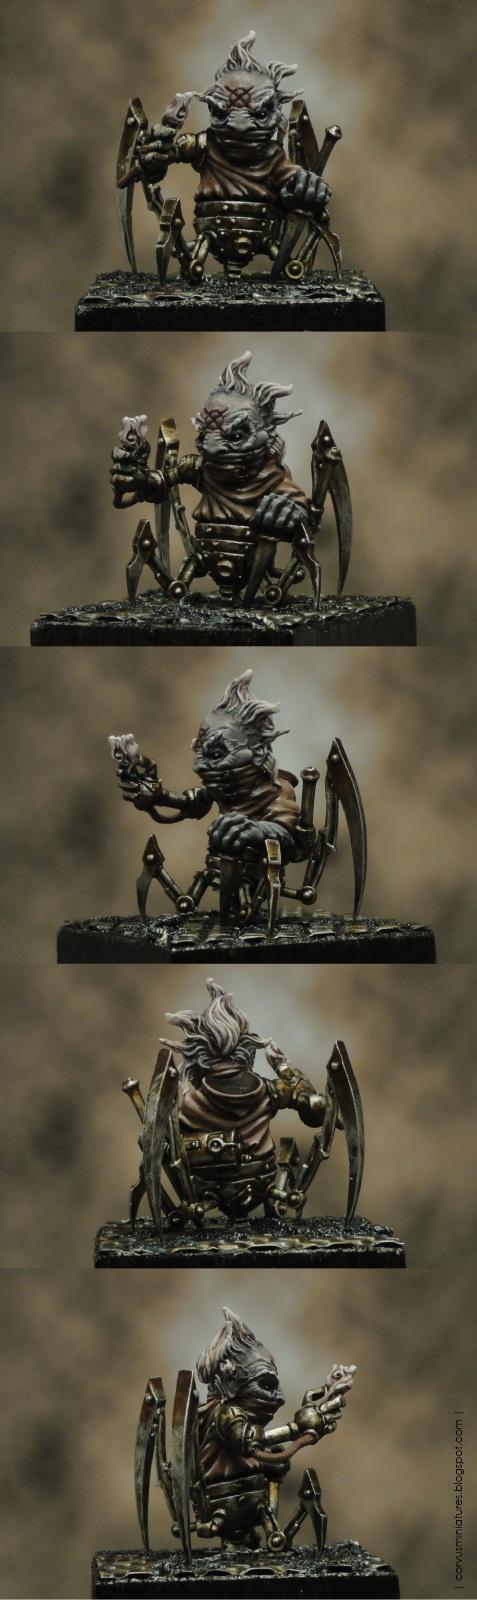 Nurbald the Sculptor